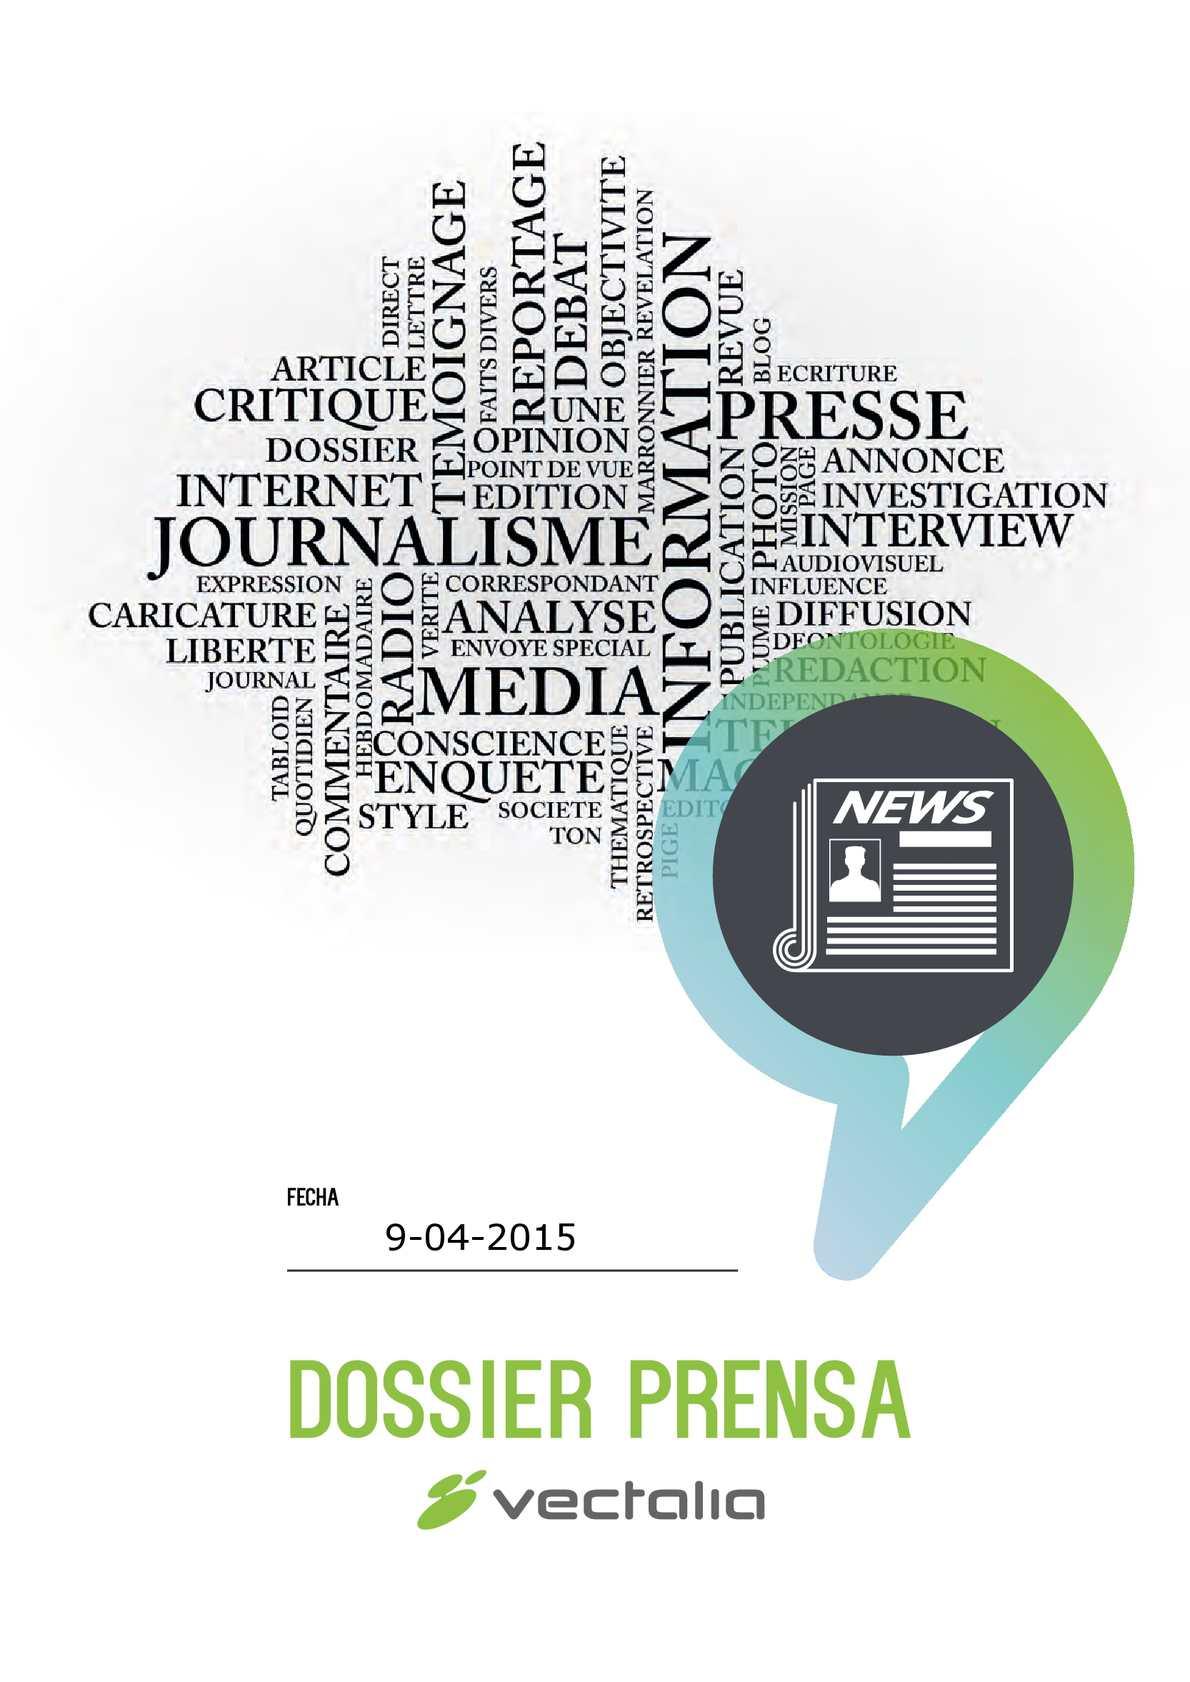 Calaméo - Dossier Prensa; Jueves, 9 De Abril De 2015